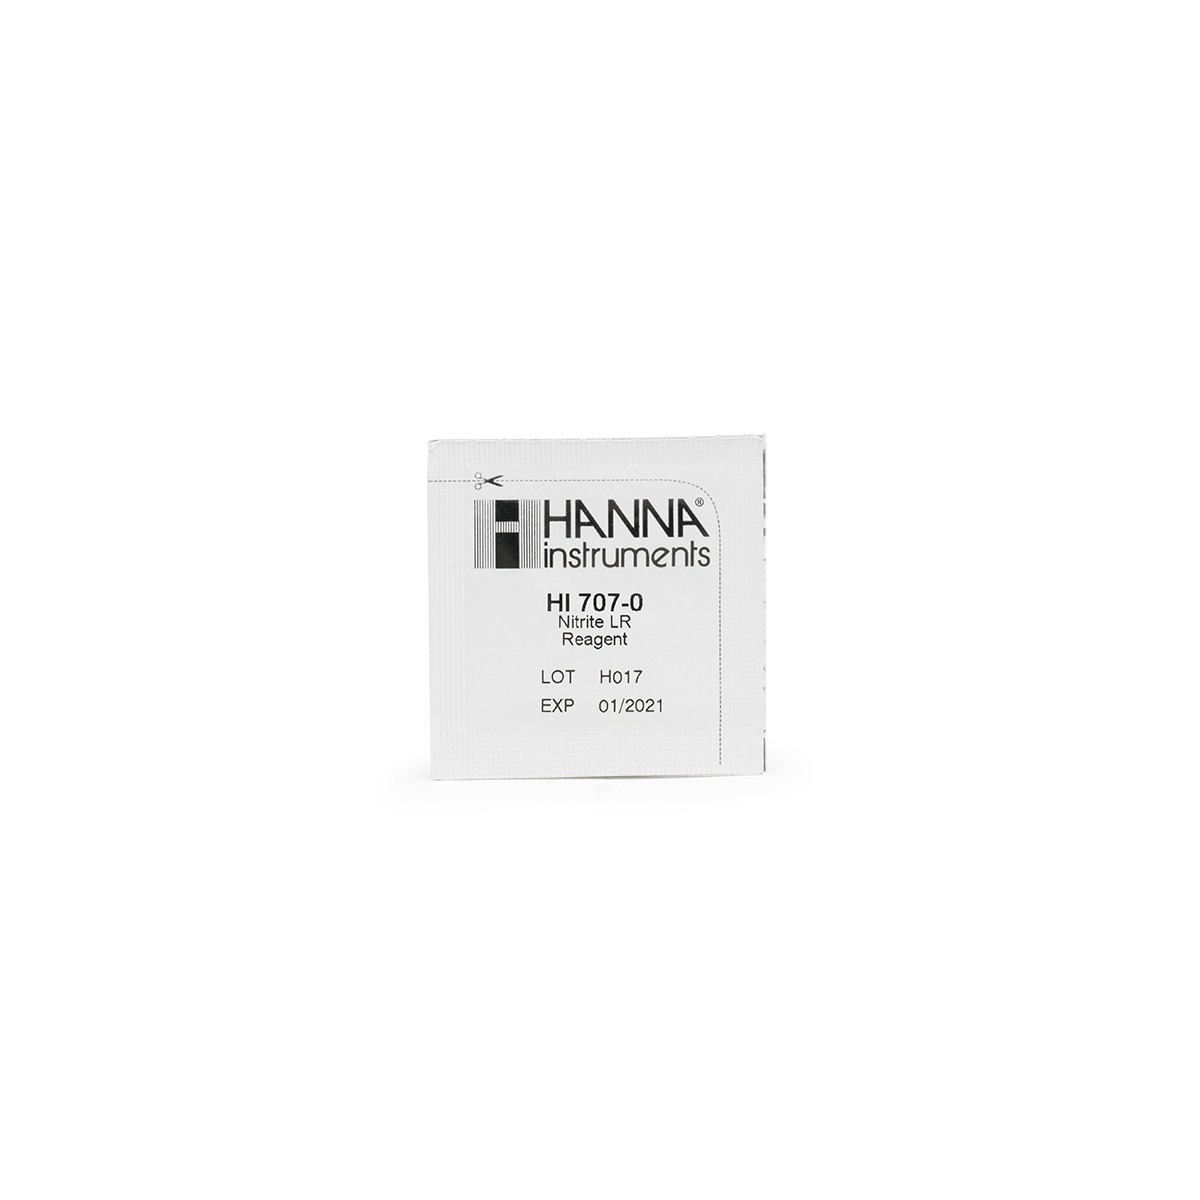 Thuốc Thử Cho Checker Nitrit LR HI707, 25 Lần Đo HI707-25